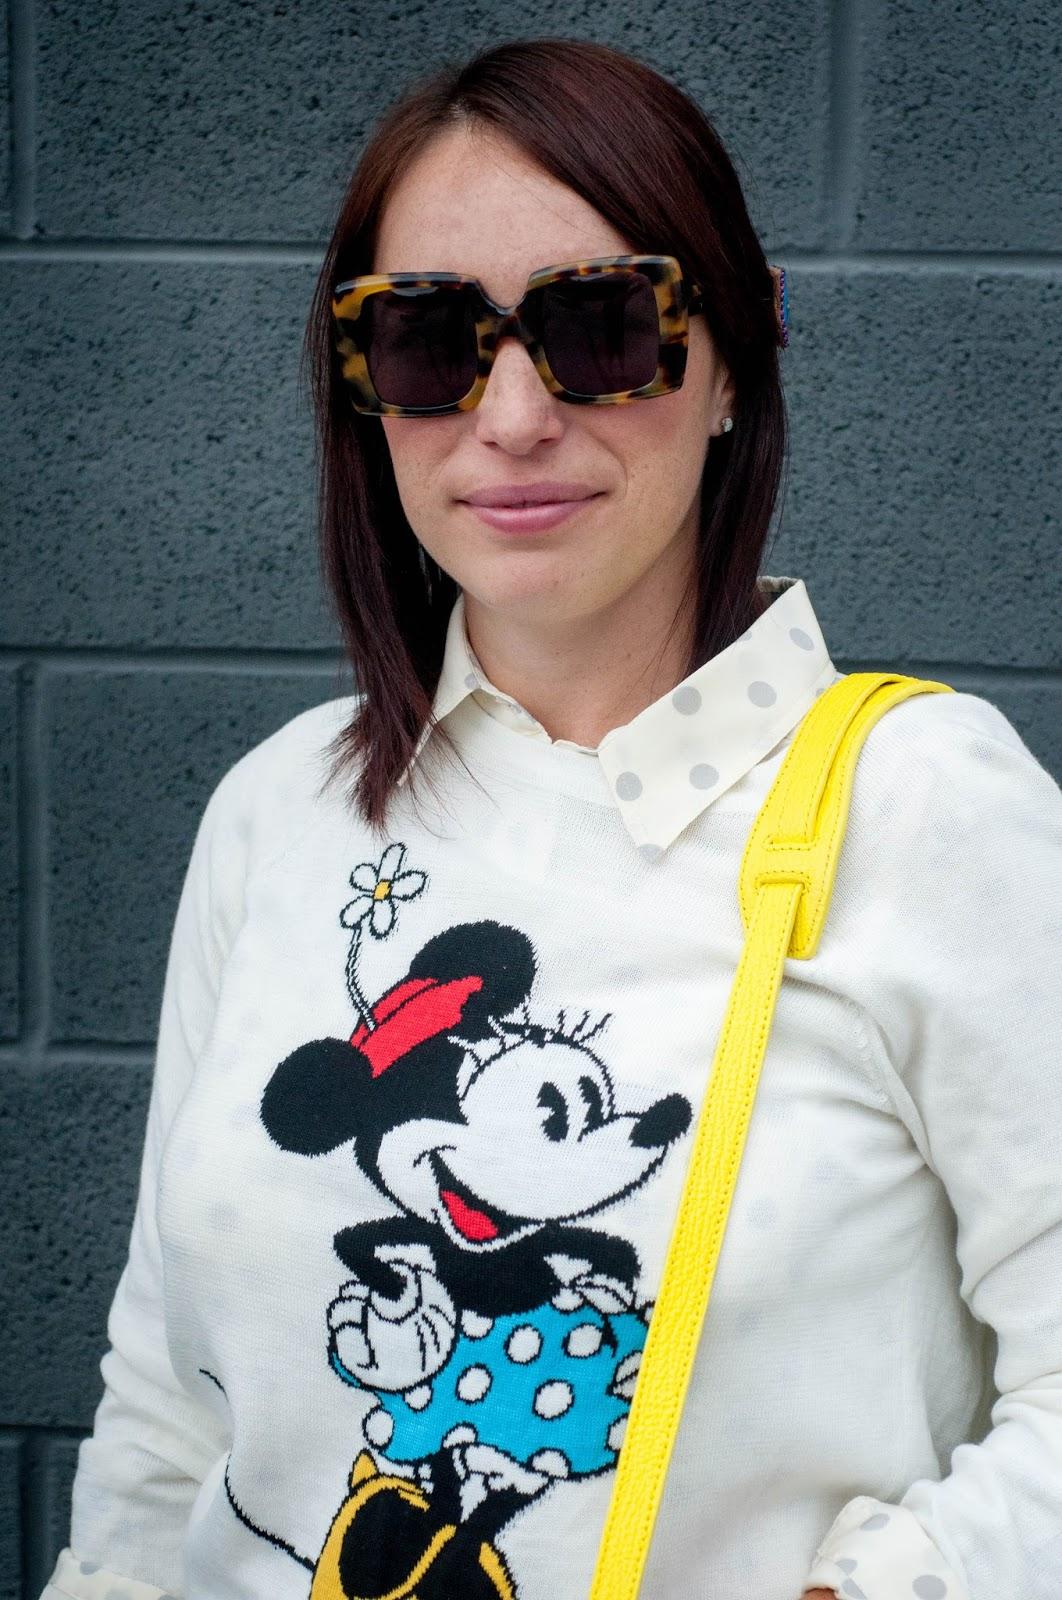 karen walker sunglasses, karen walker bestsy, minnie mouse pullover sweater, minnie mouse, jcrew polka dot silk blouse, ootd